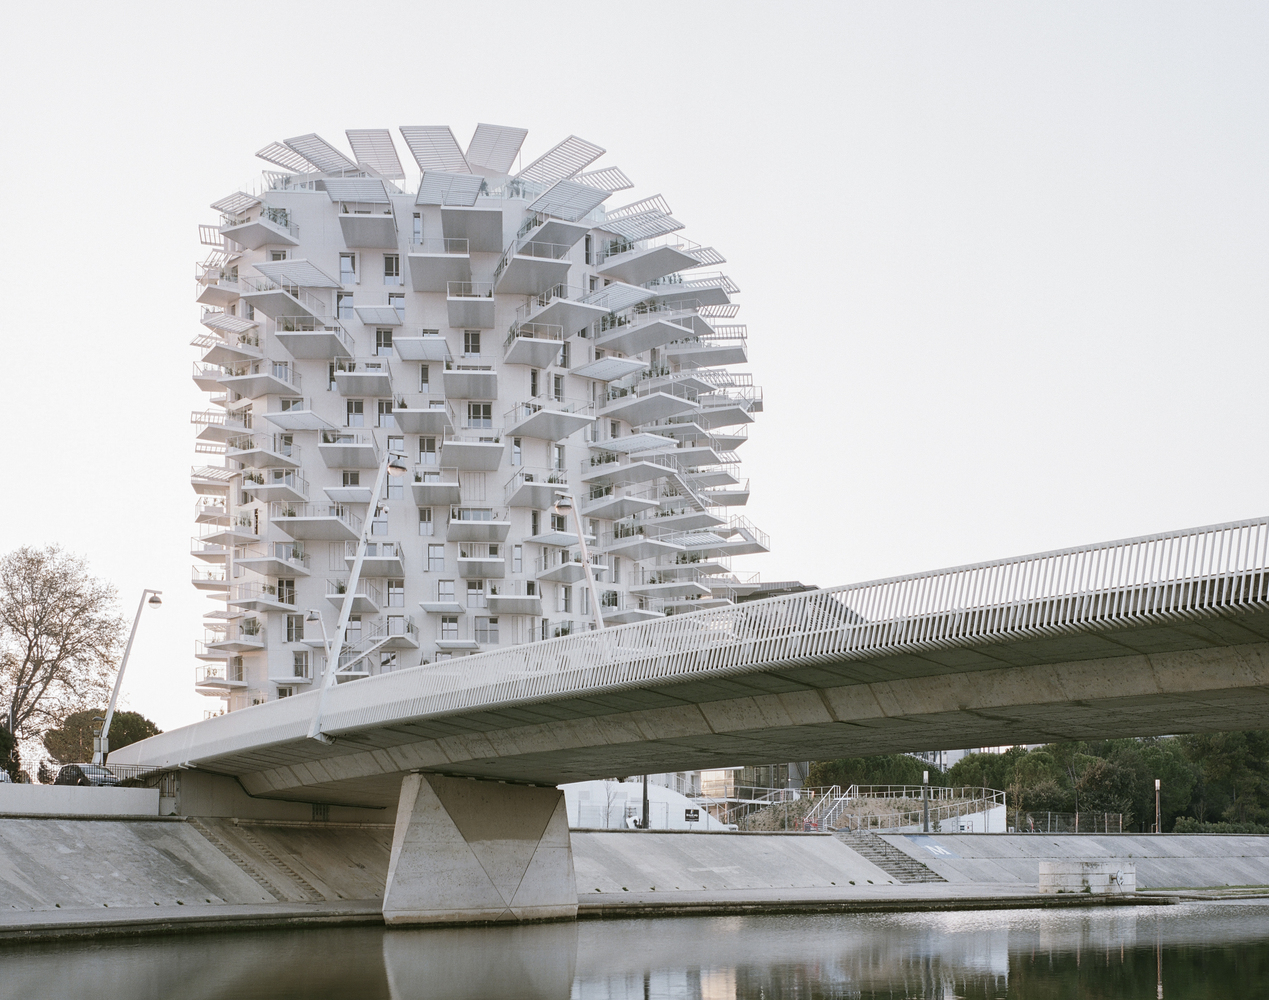 L'Arbre Blanc Residential Tower / Sou Fujimoto Architects + Nicolas Laisné + OXO architects + Dimitri Roussel